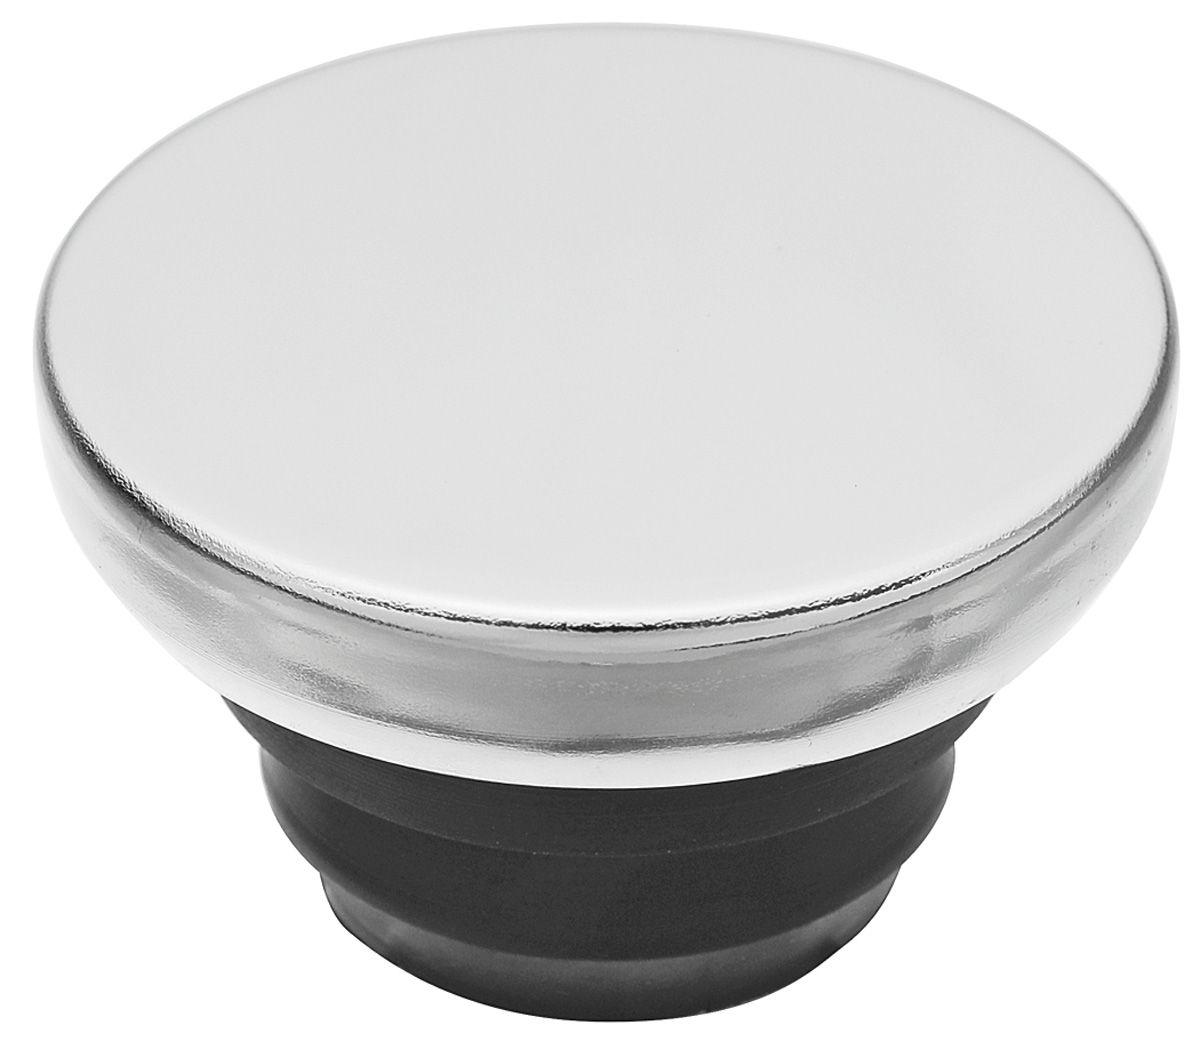 "Photo of Oil Filler Hole Cap - Chrome (Push-In) 1-1/4"" Hole"